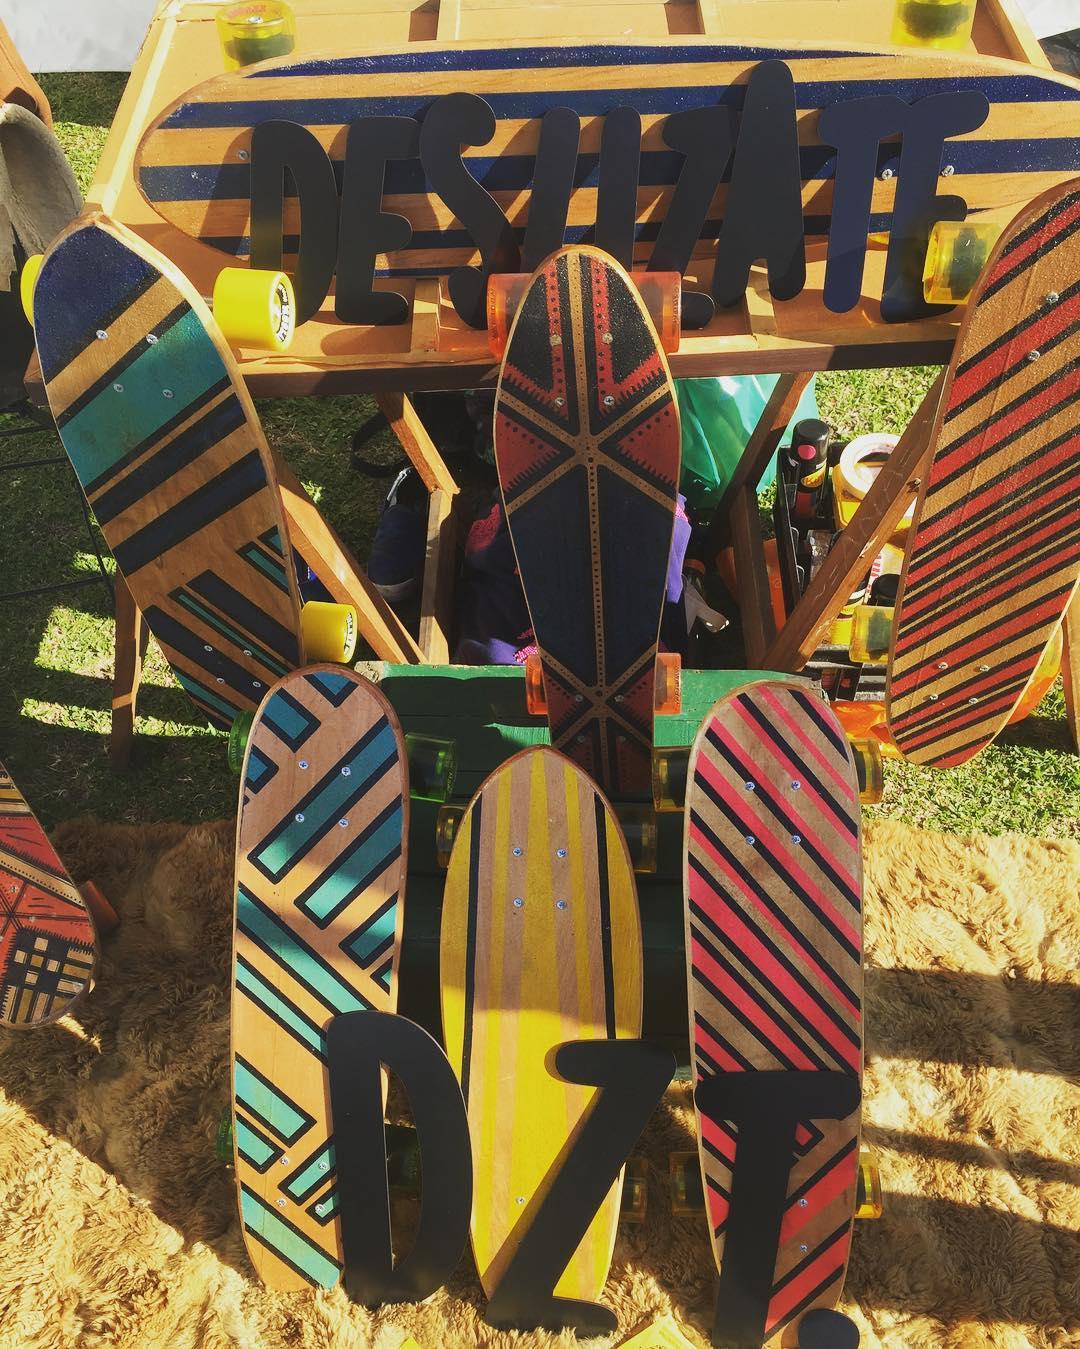 Rock & skate #nordelta #skate #rock . . . . . #skateboard #pennyboard #longboard #rock #skate #music #festival #handmade